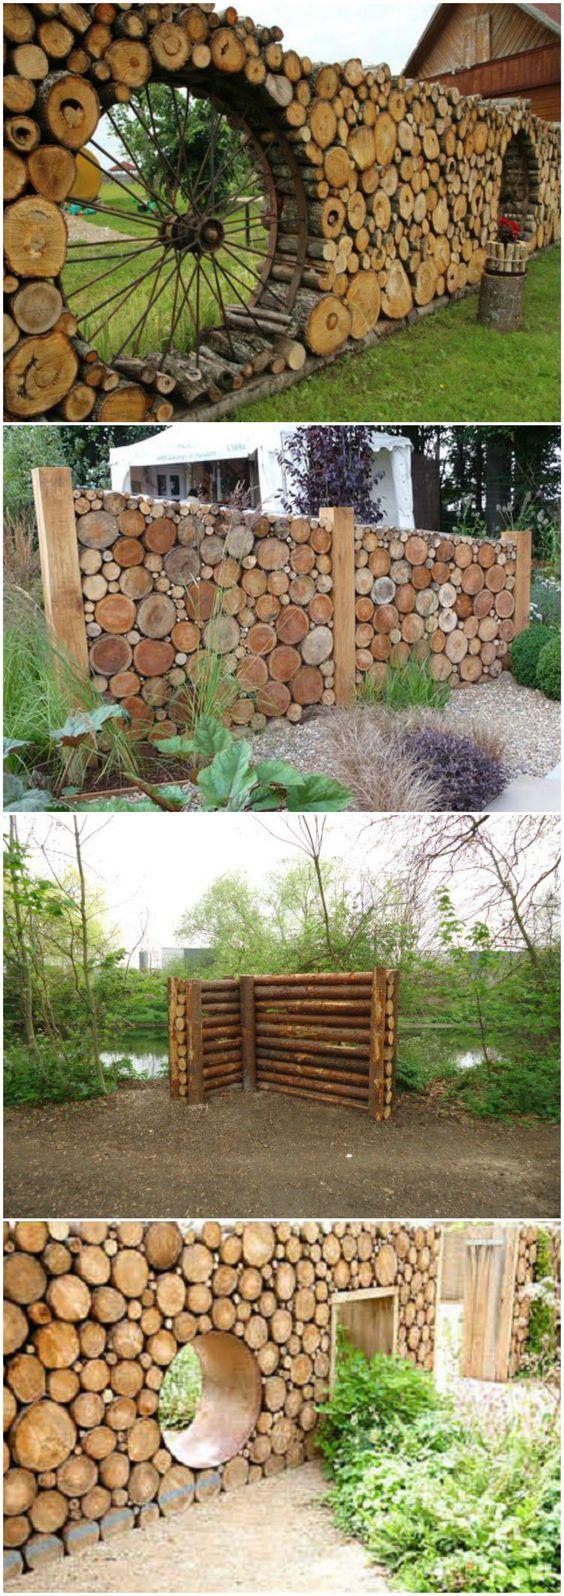 Recinzioni Per Case Di Montagna cordwood fences more: #outdoordecor (outdoor decor) | tronco